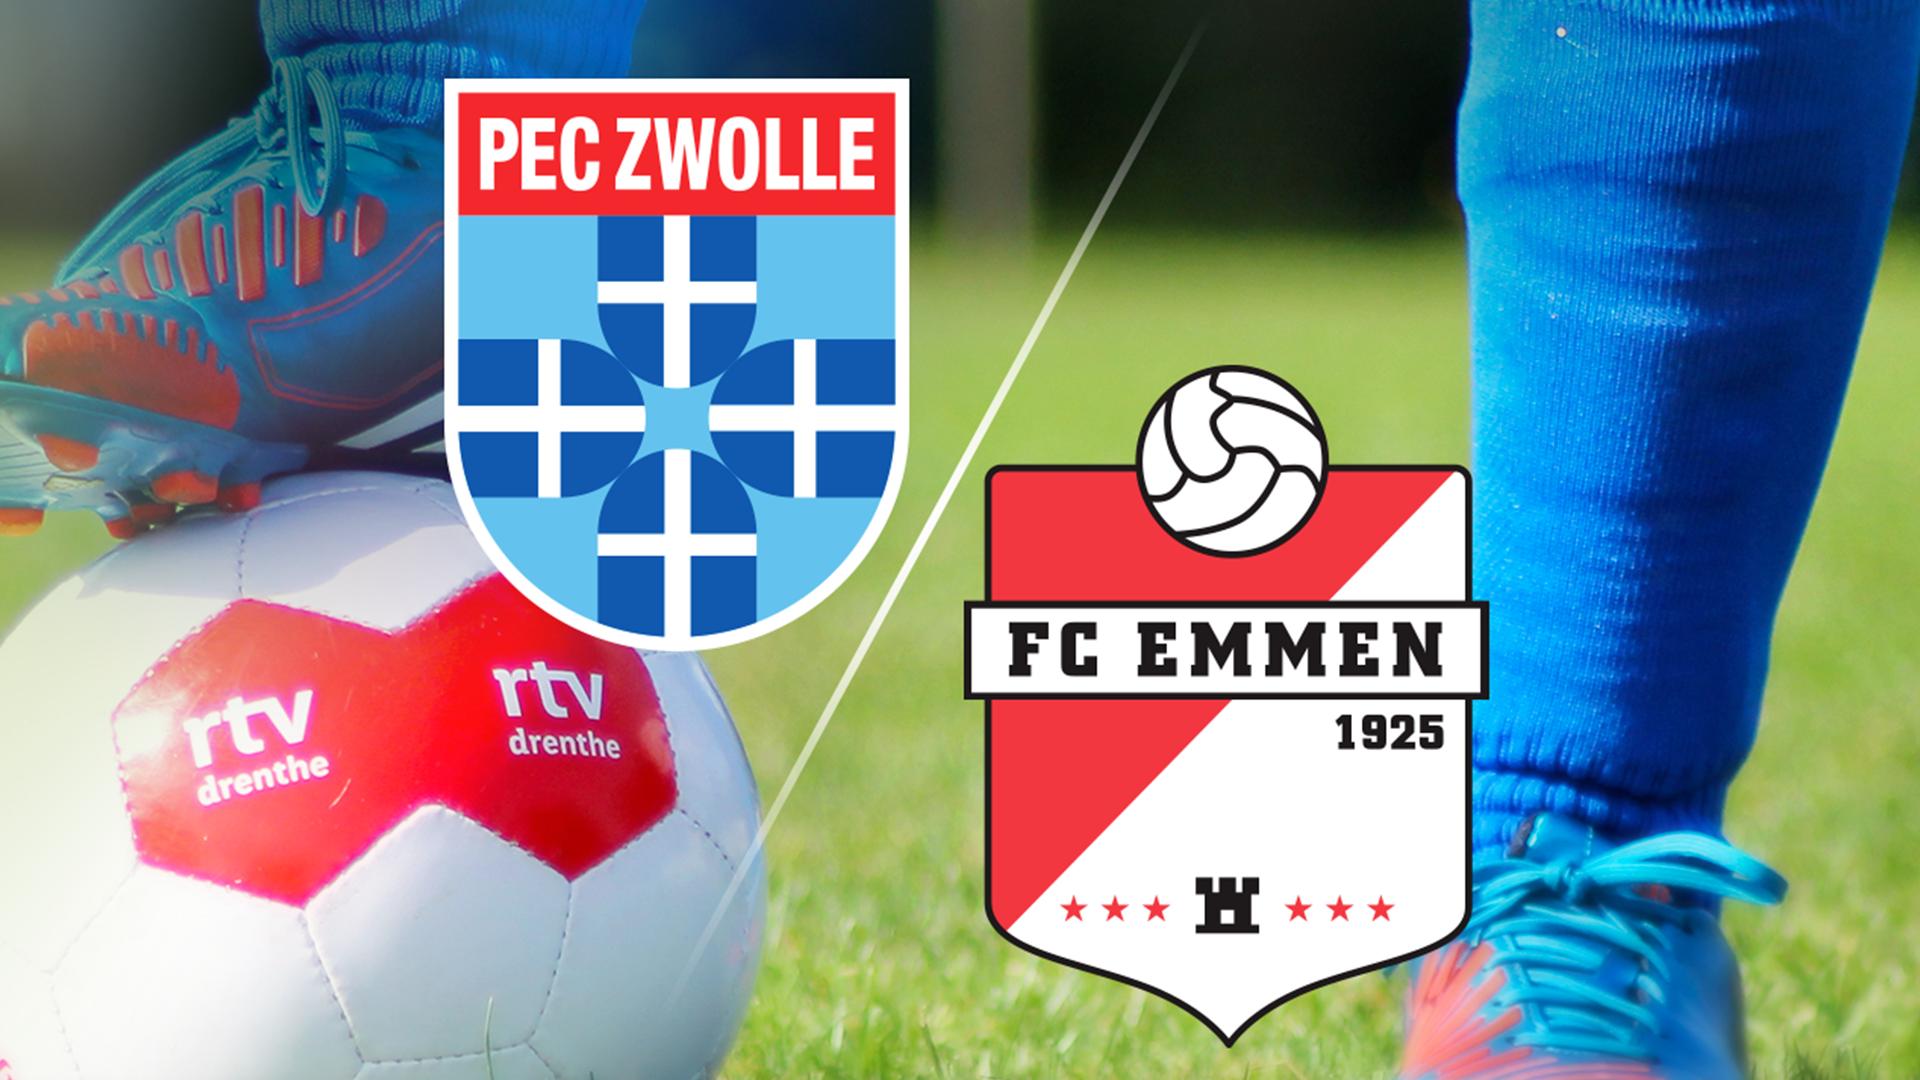 Liveblog Pec Zwolle Fc Emmen 24liveblog